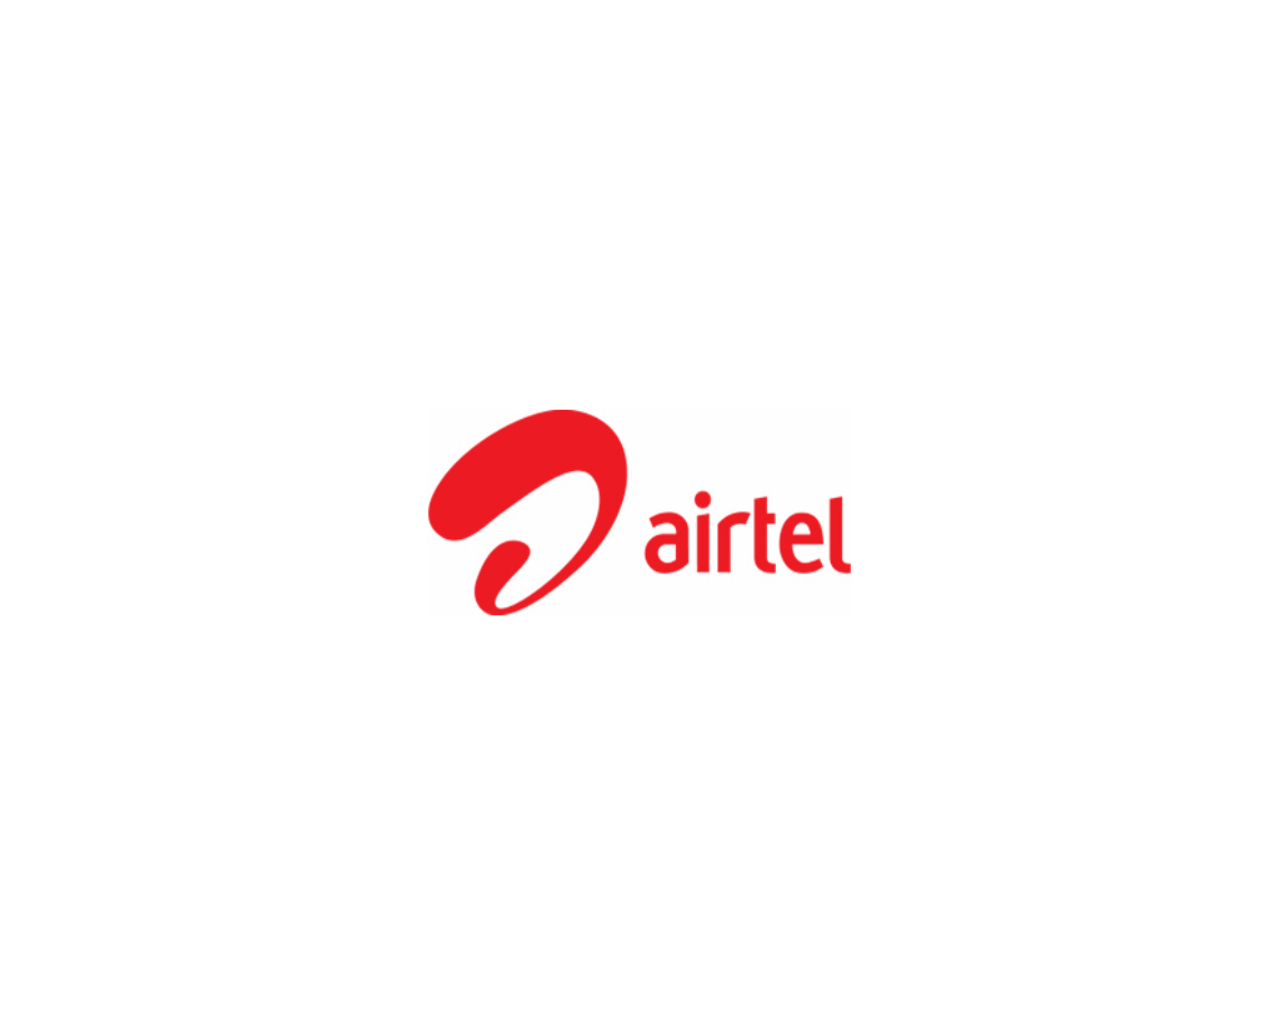 new airtel tone free download